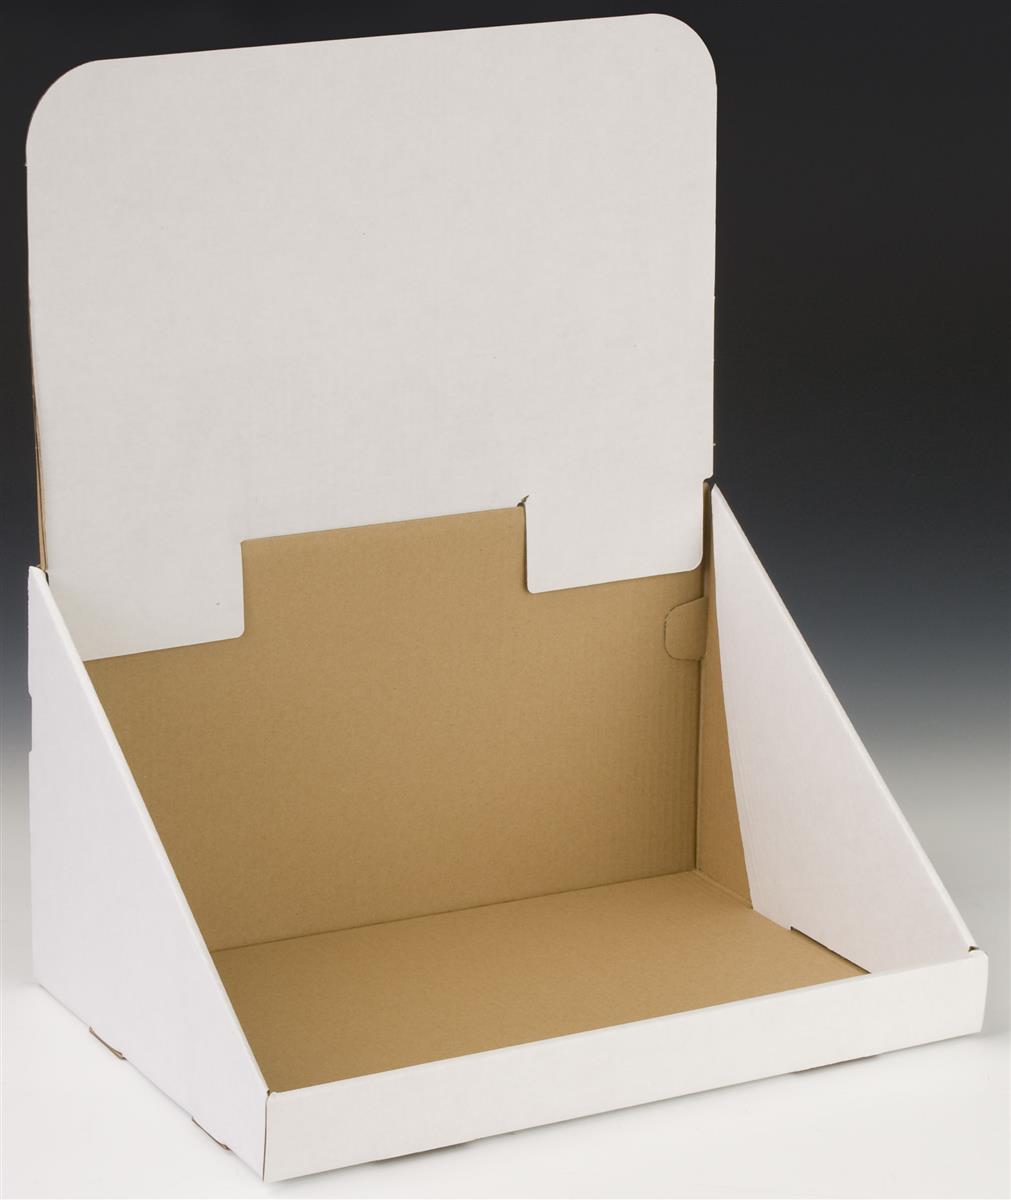 Oversize Cardboard Countertop Bin 22 5 H White Counter